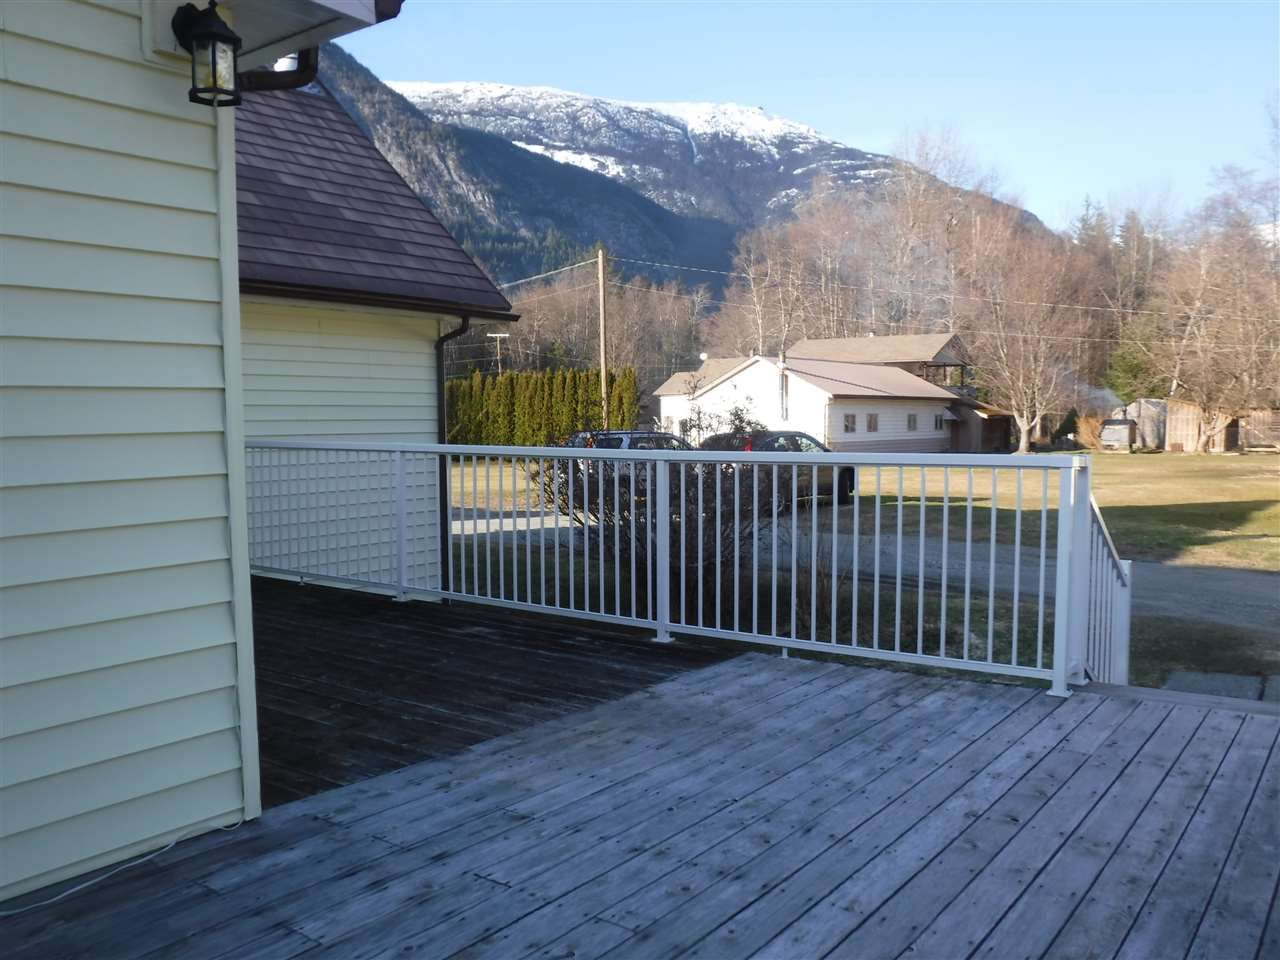 Photo 4: Photos: 1599 MACKENZIE Highway in Bella Coola: Bella Coola/Hagensborg House for sale (Williams Lake (Zone 27))  : MLS®# R2449026